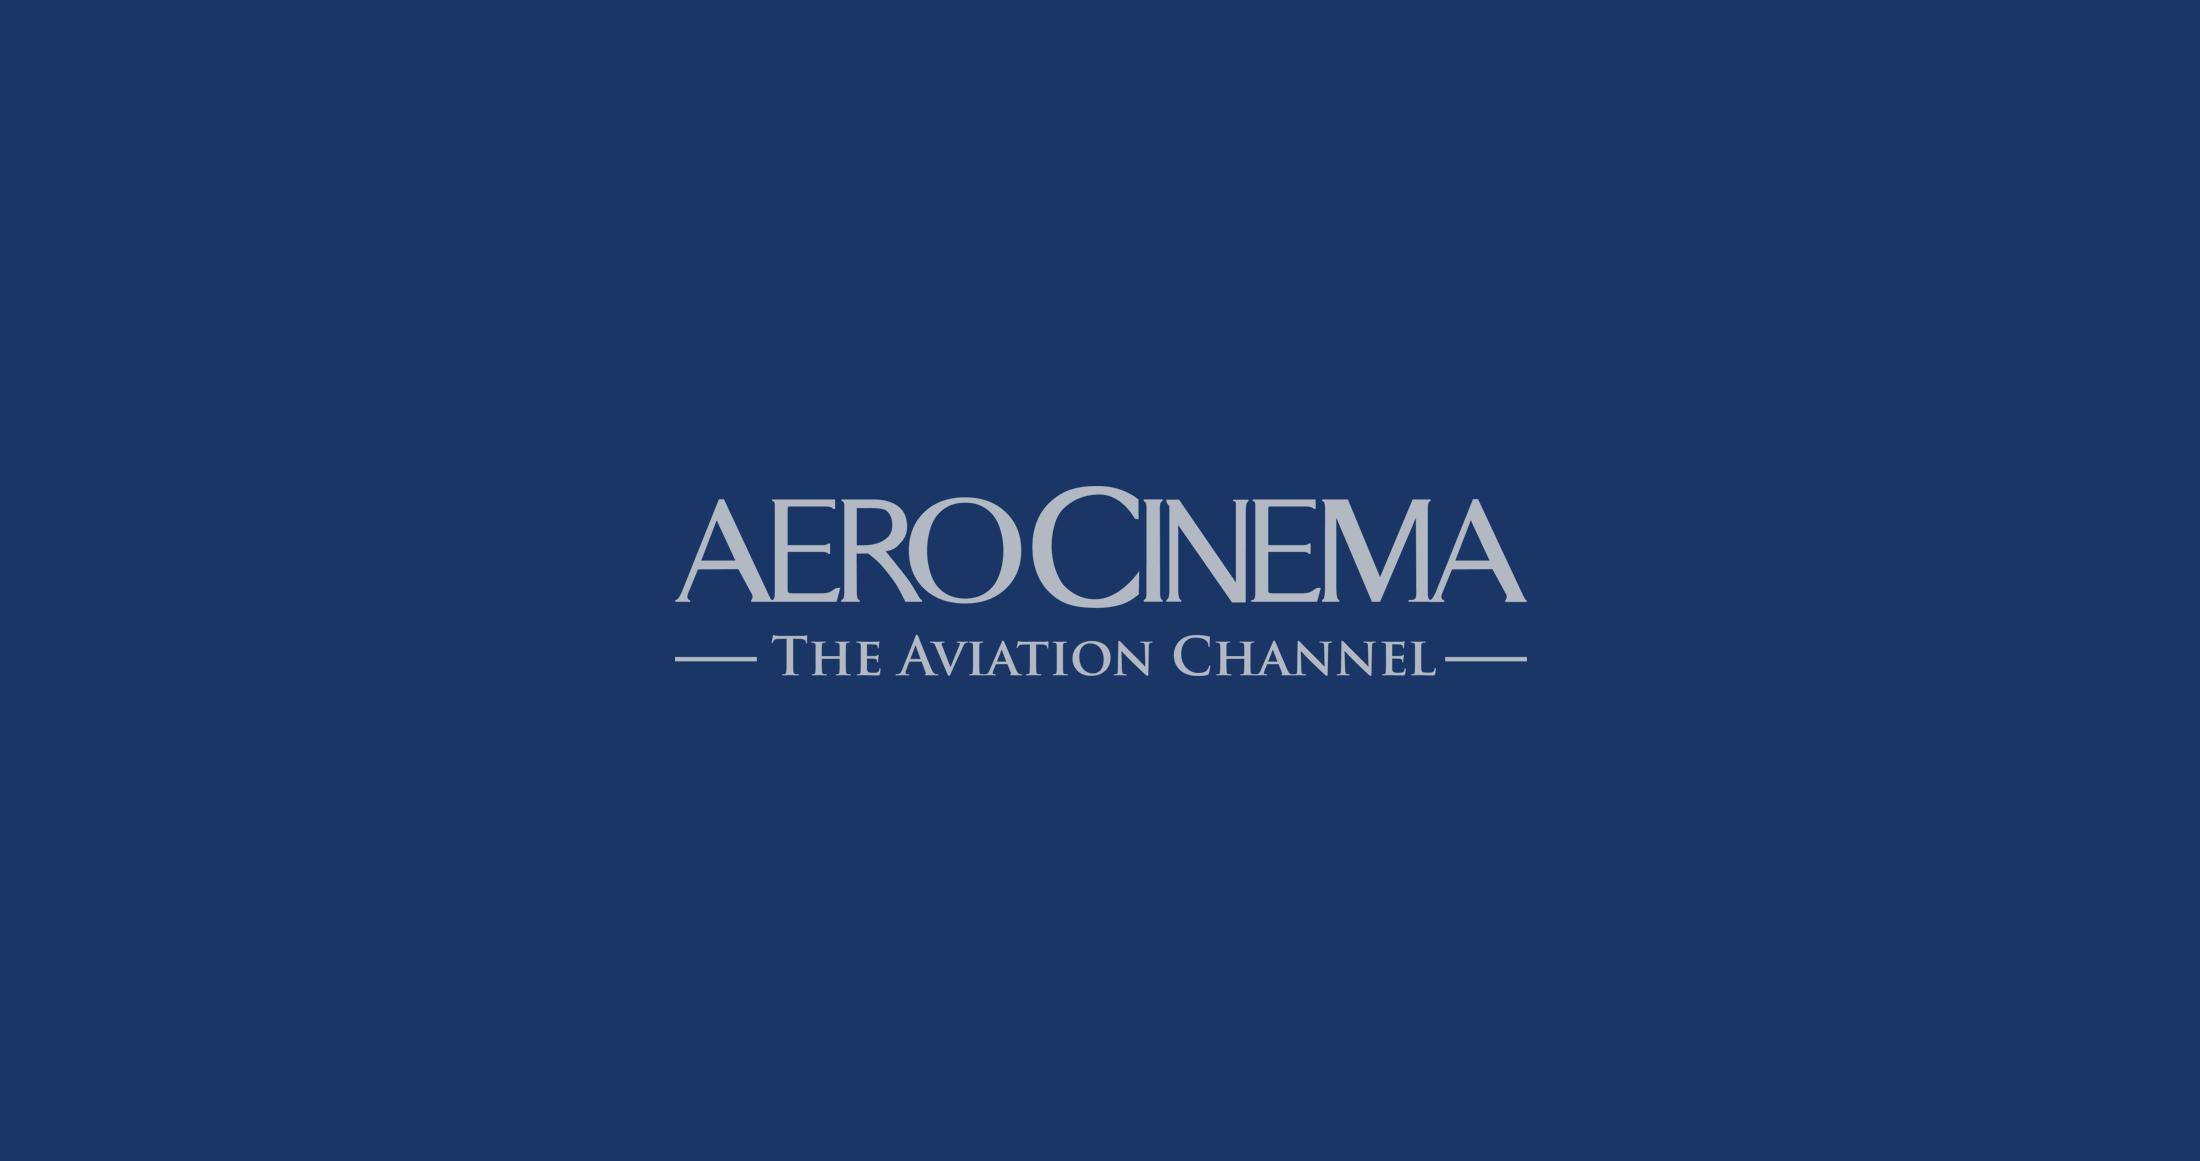 Aerocinema_image4